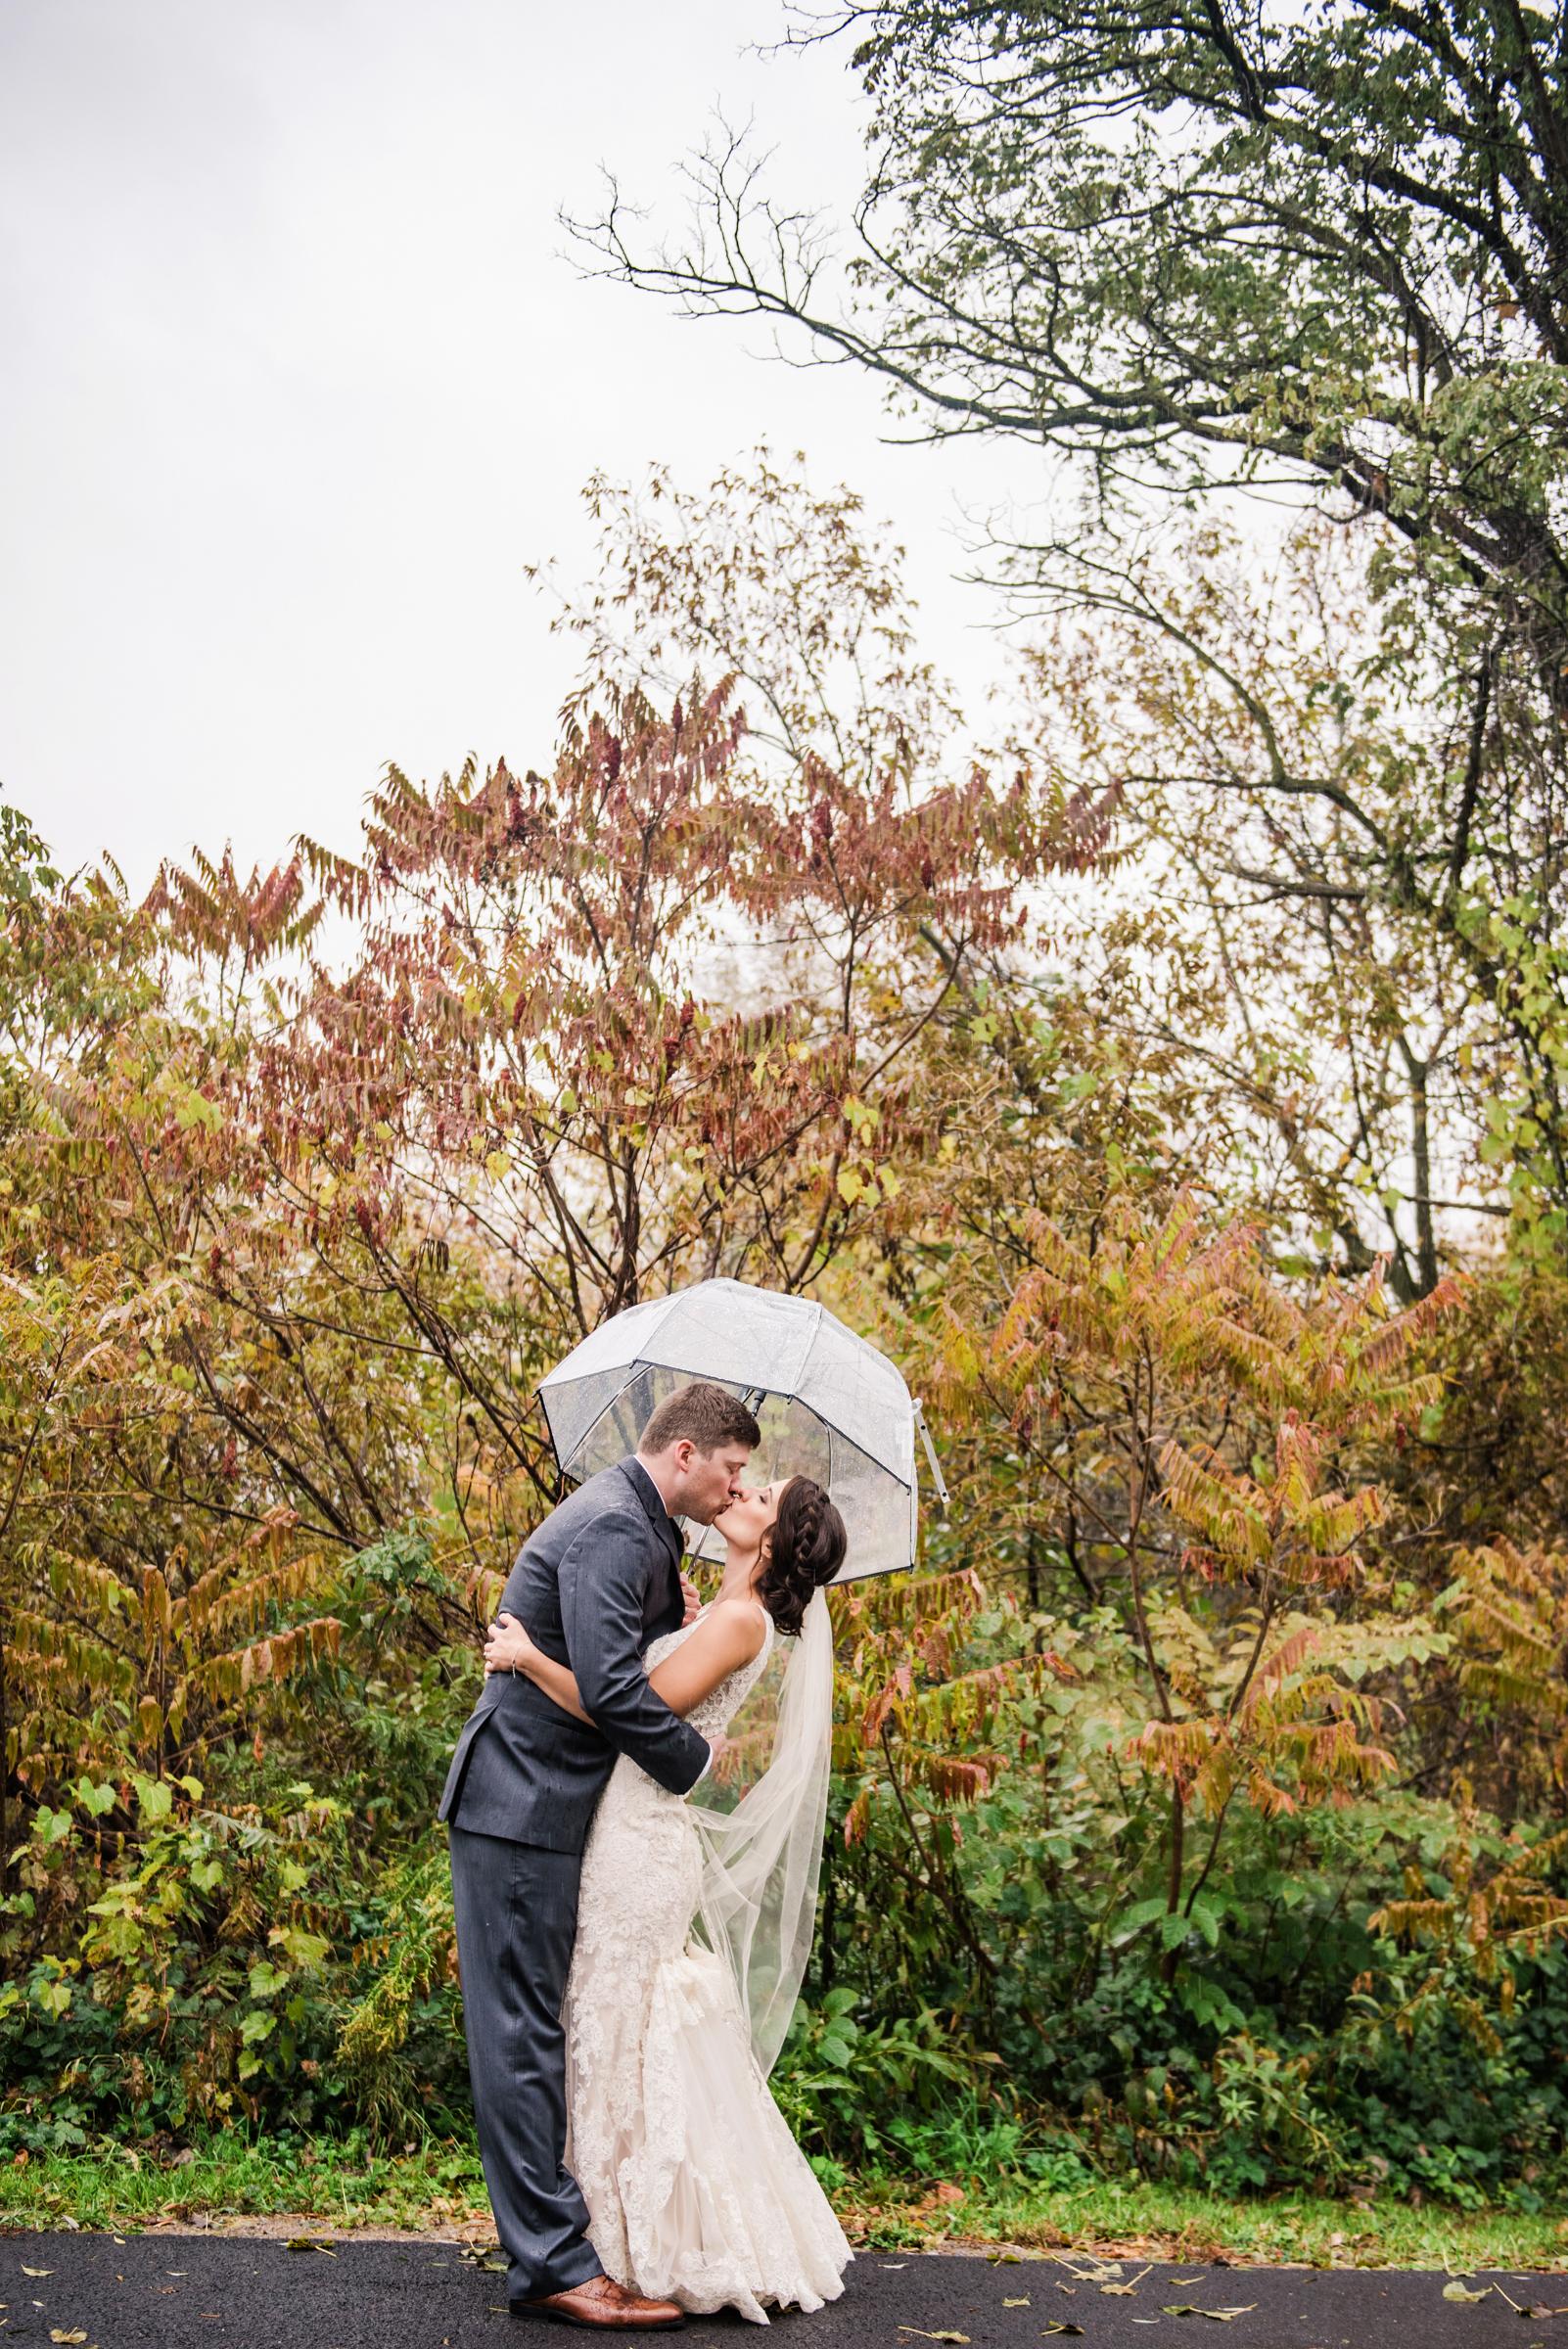 Wolf_Oak_Acres_Central_NY_Wedding_JILL_STUDIO_Rochester_NY_Photographer_DSC_7491.jpg